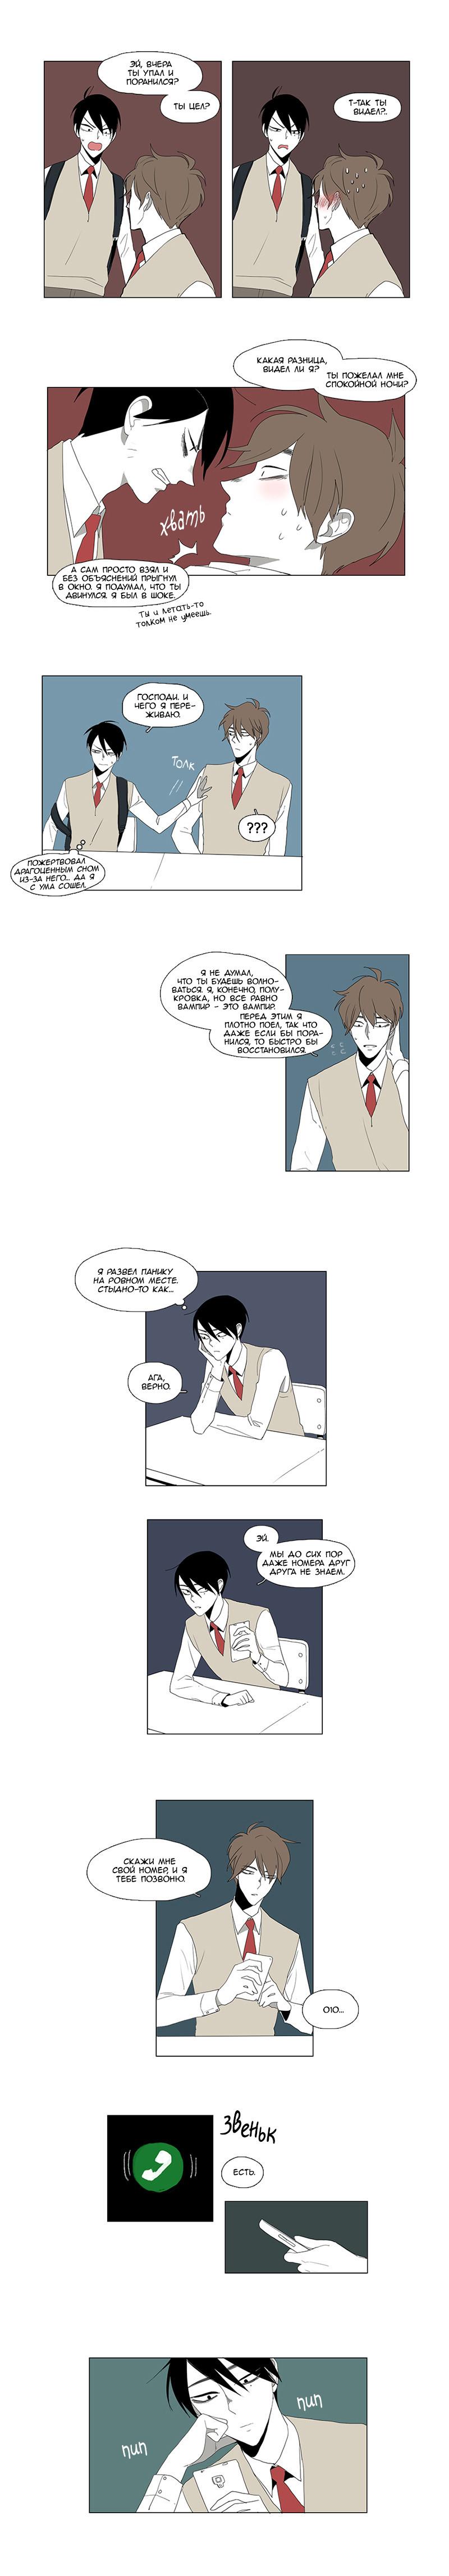 https://r1.ninemanga.com/comics/pic2/33/27873/278406/1447697132383.jpg Page 6